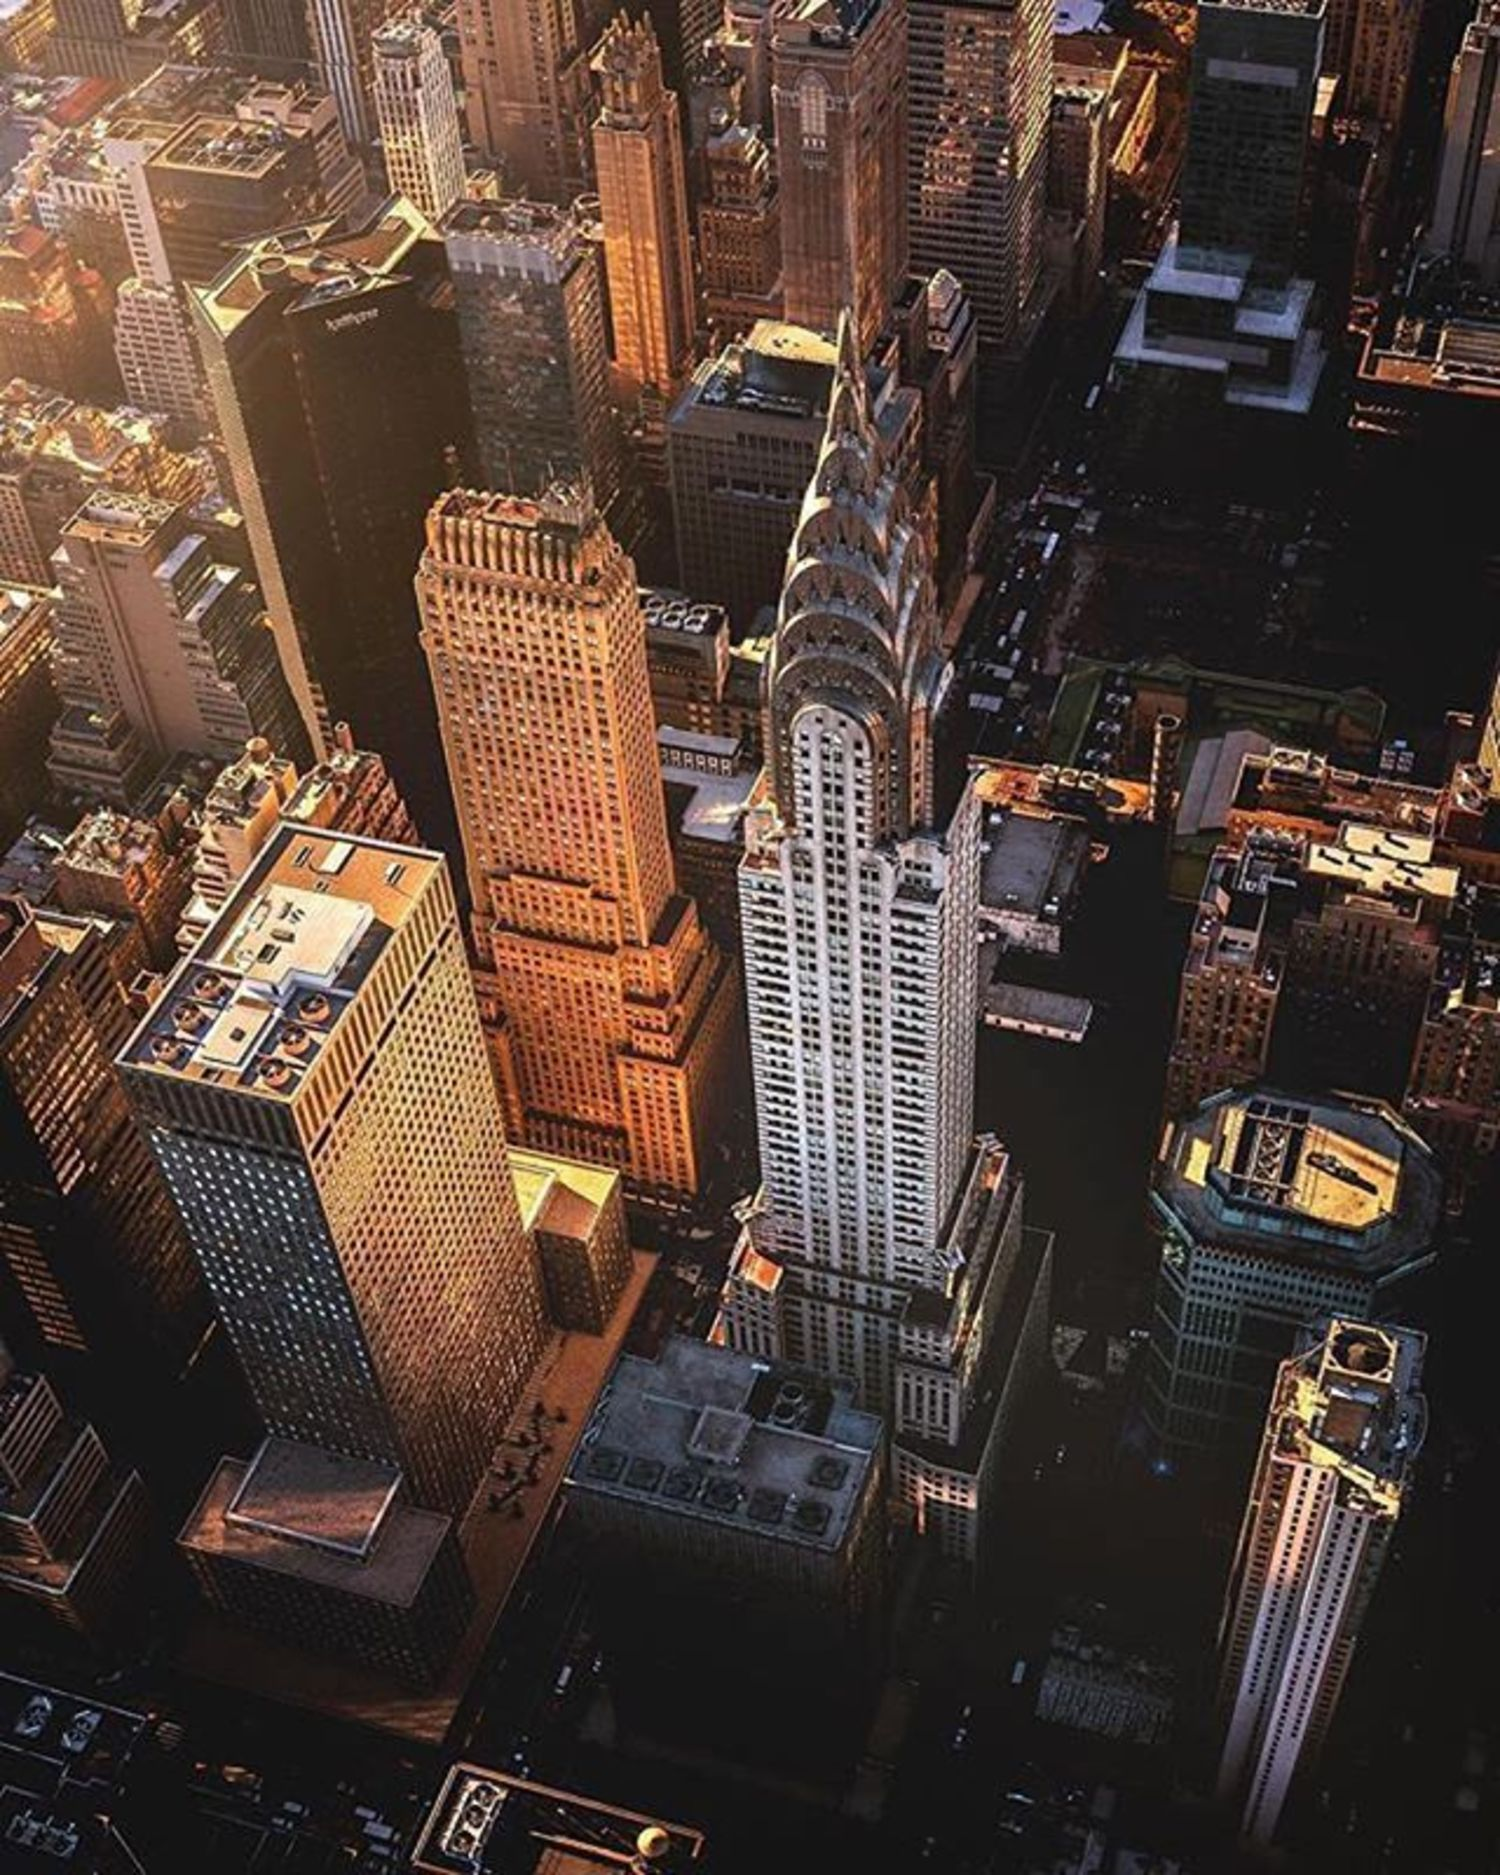 Chrysler Building, New York, New York. Photo via @flynyon #viewingnyc #newyork #newyorkcity #nyc